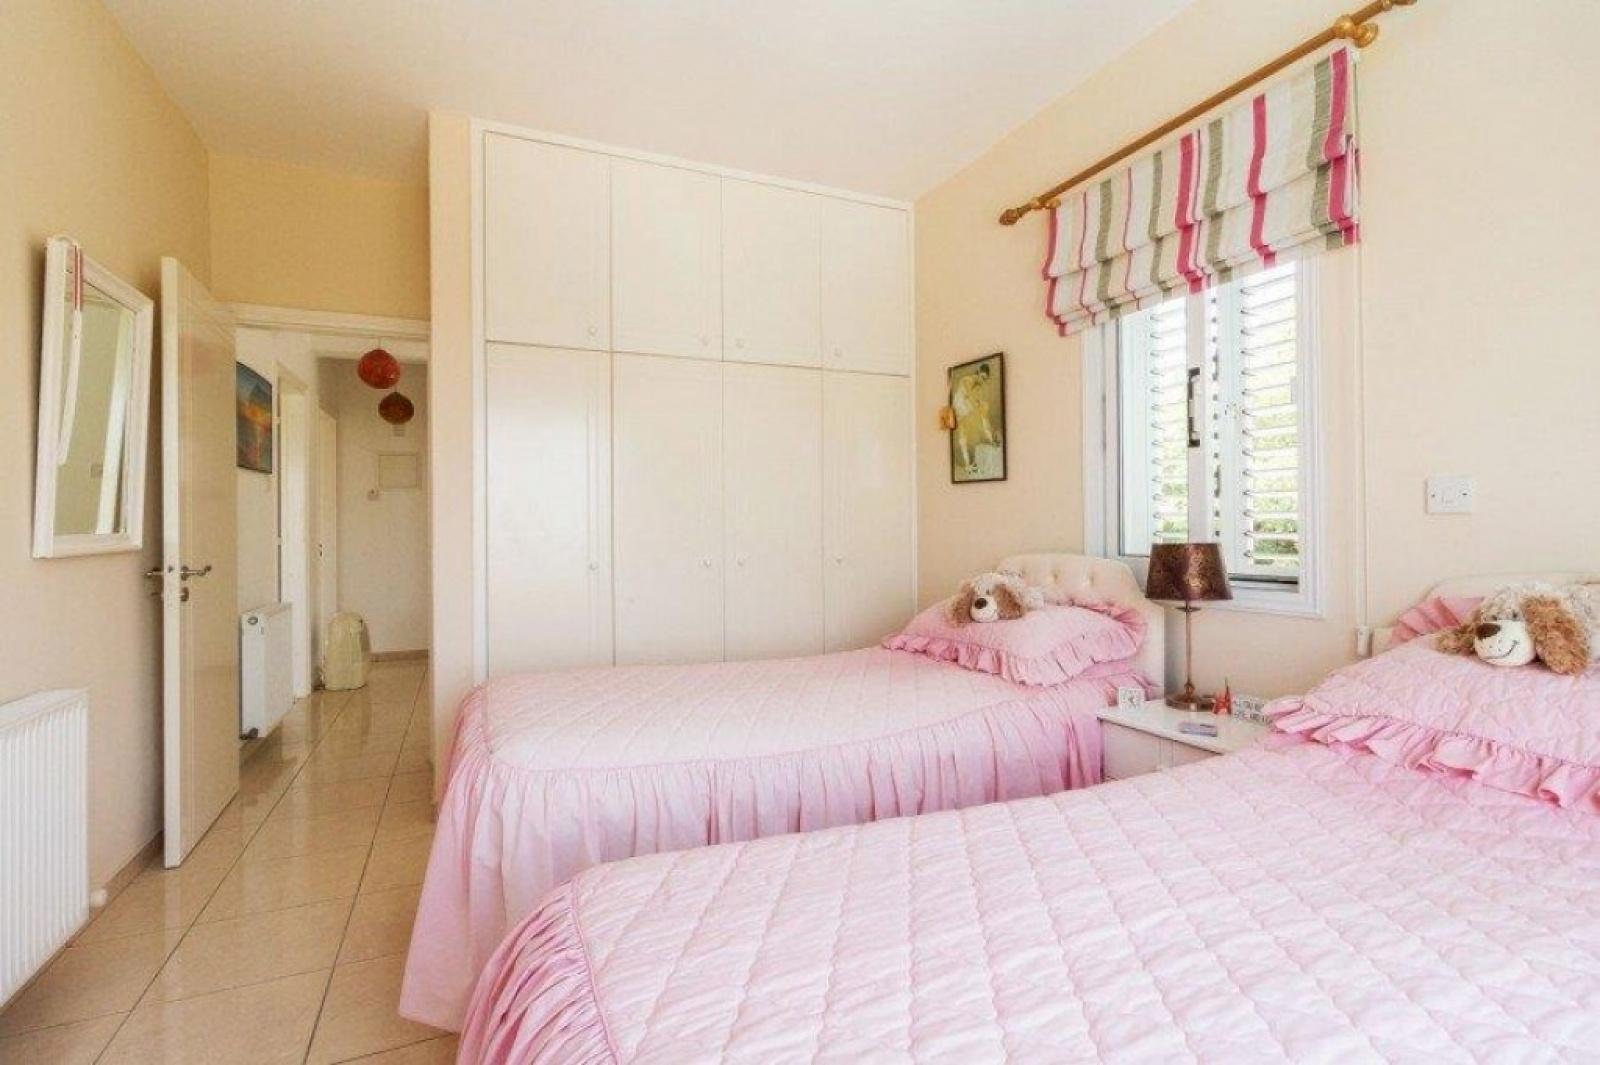 Residential Villa - Skoulli villa For Sale